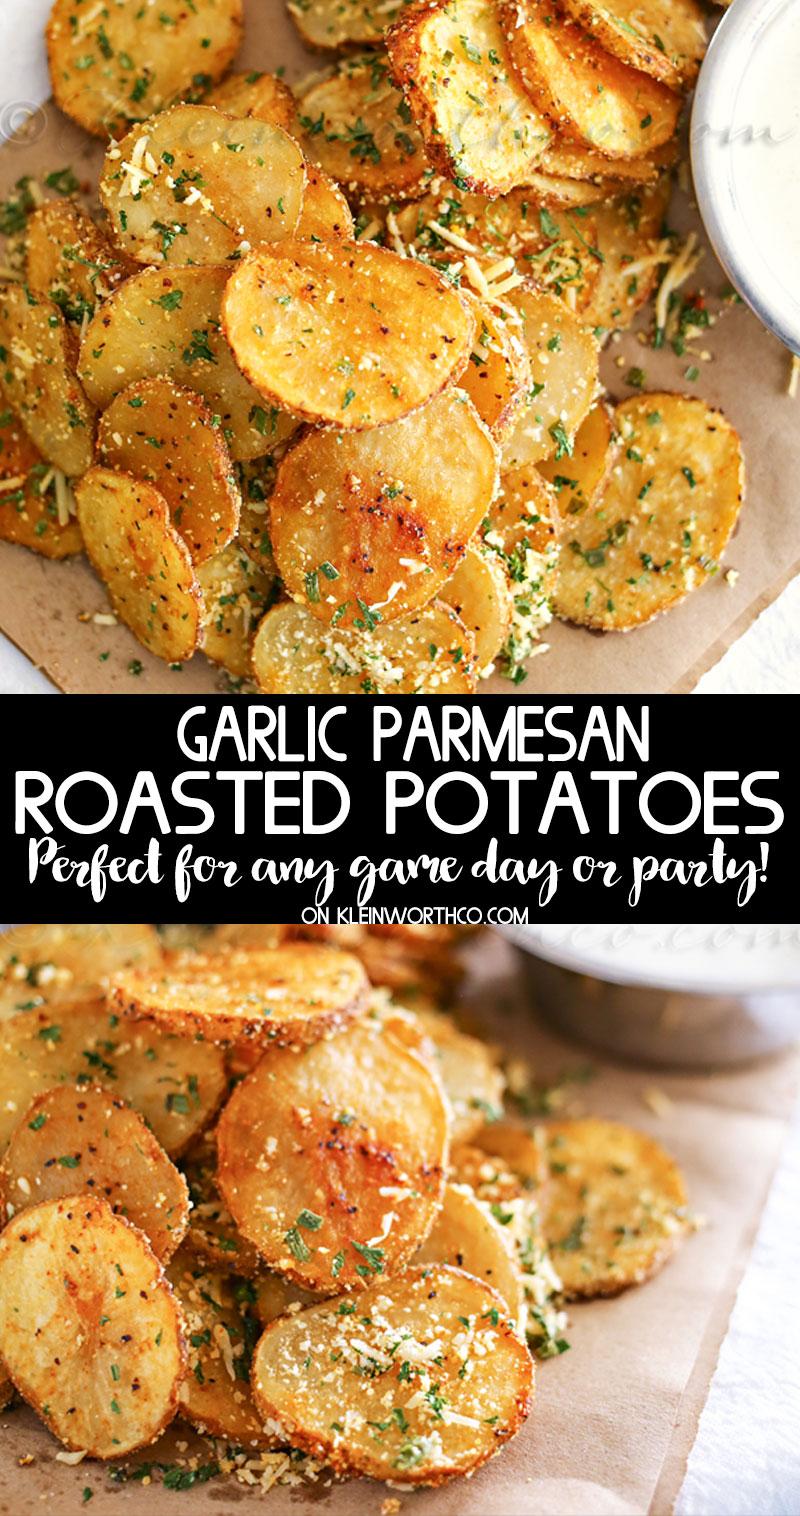 Parmesan-Bratkartoffeln #dinnersidedishes Parmesan-Bratkartoffeln sind nur eine … – Keto dinner recipes